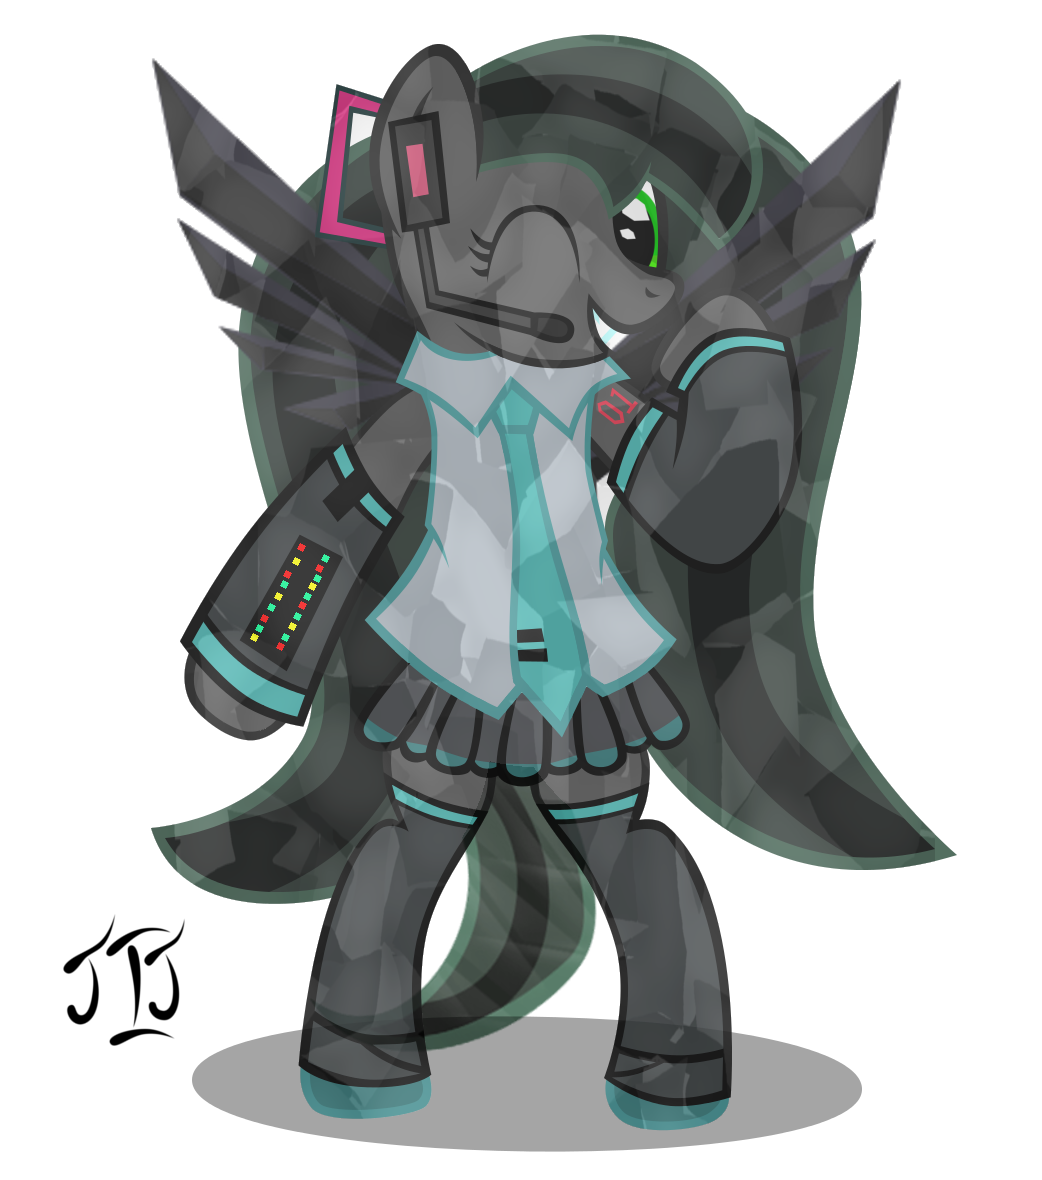 Hatsune Obsidiku (Mlp style) Vocaloid by Hornet-of-Hallownest